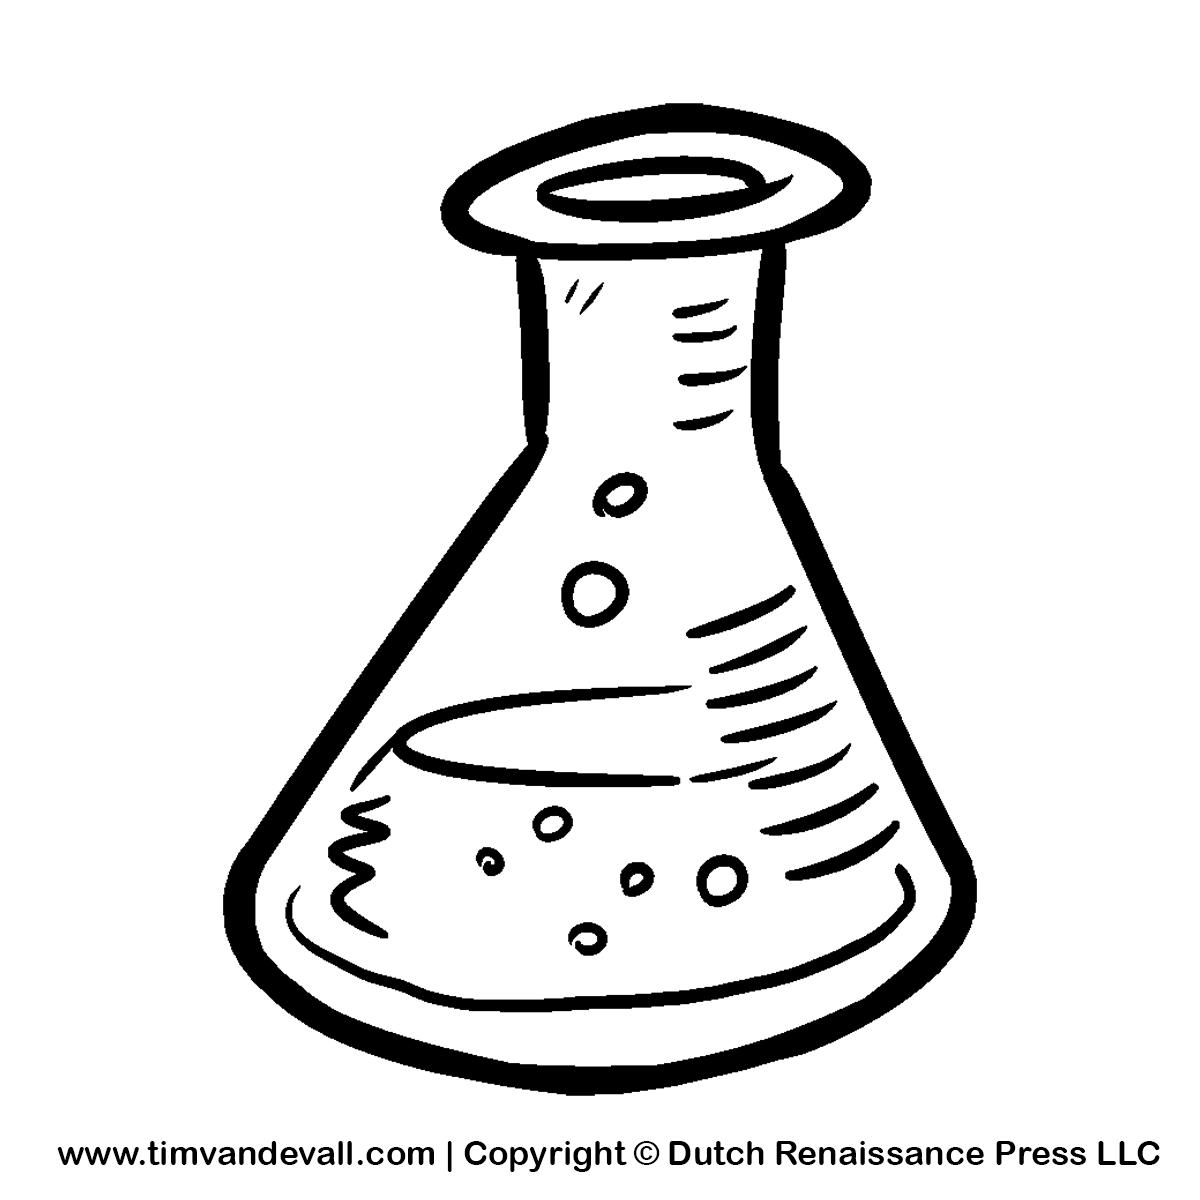 Beaker clipart draw. Science drawing at getdrawings